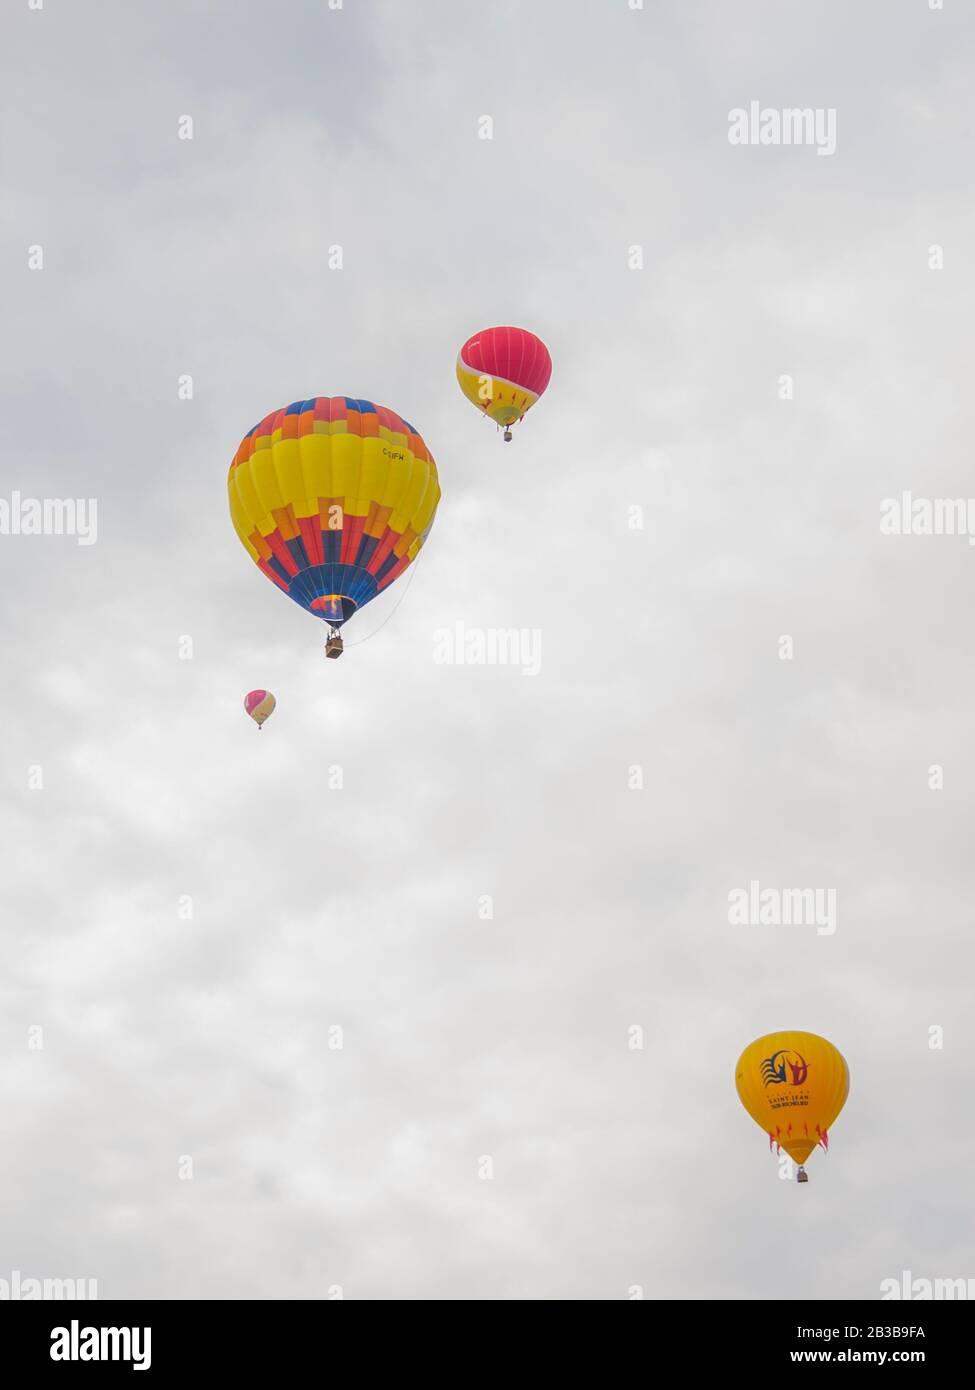 Saint-Jean-sur-Richelieu, Canada - August 18 2019: International Montgolfière Ballon festival in Saint-Jean in Canada Stock Photo